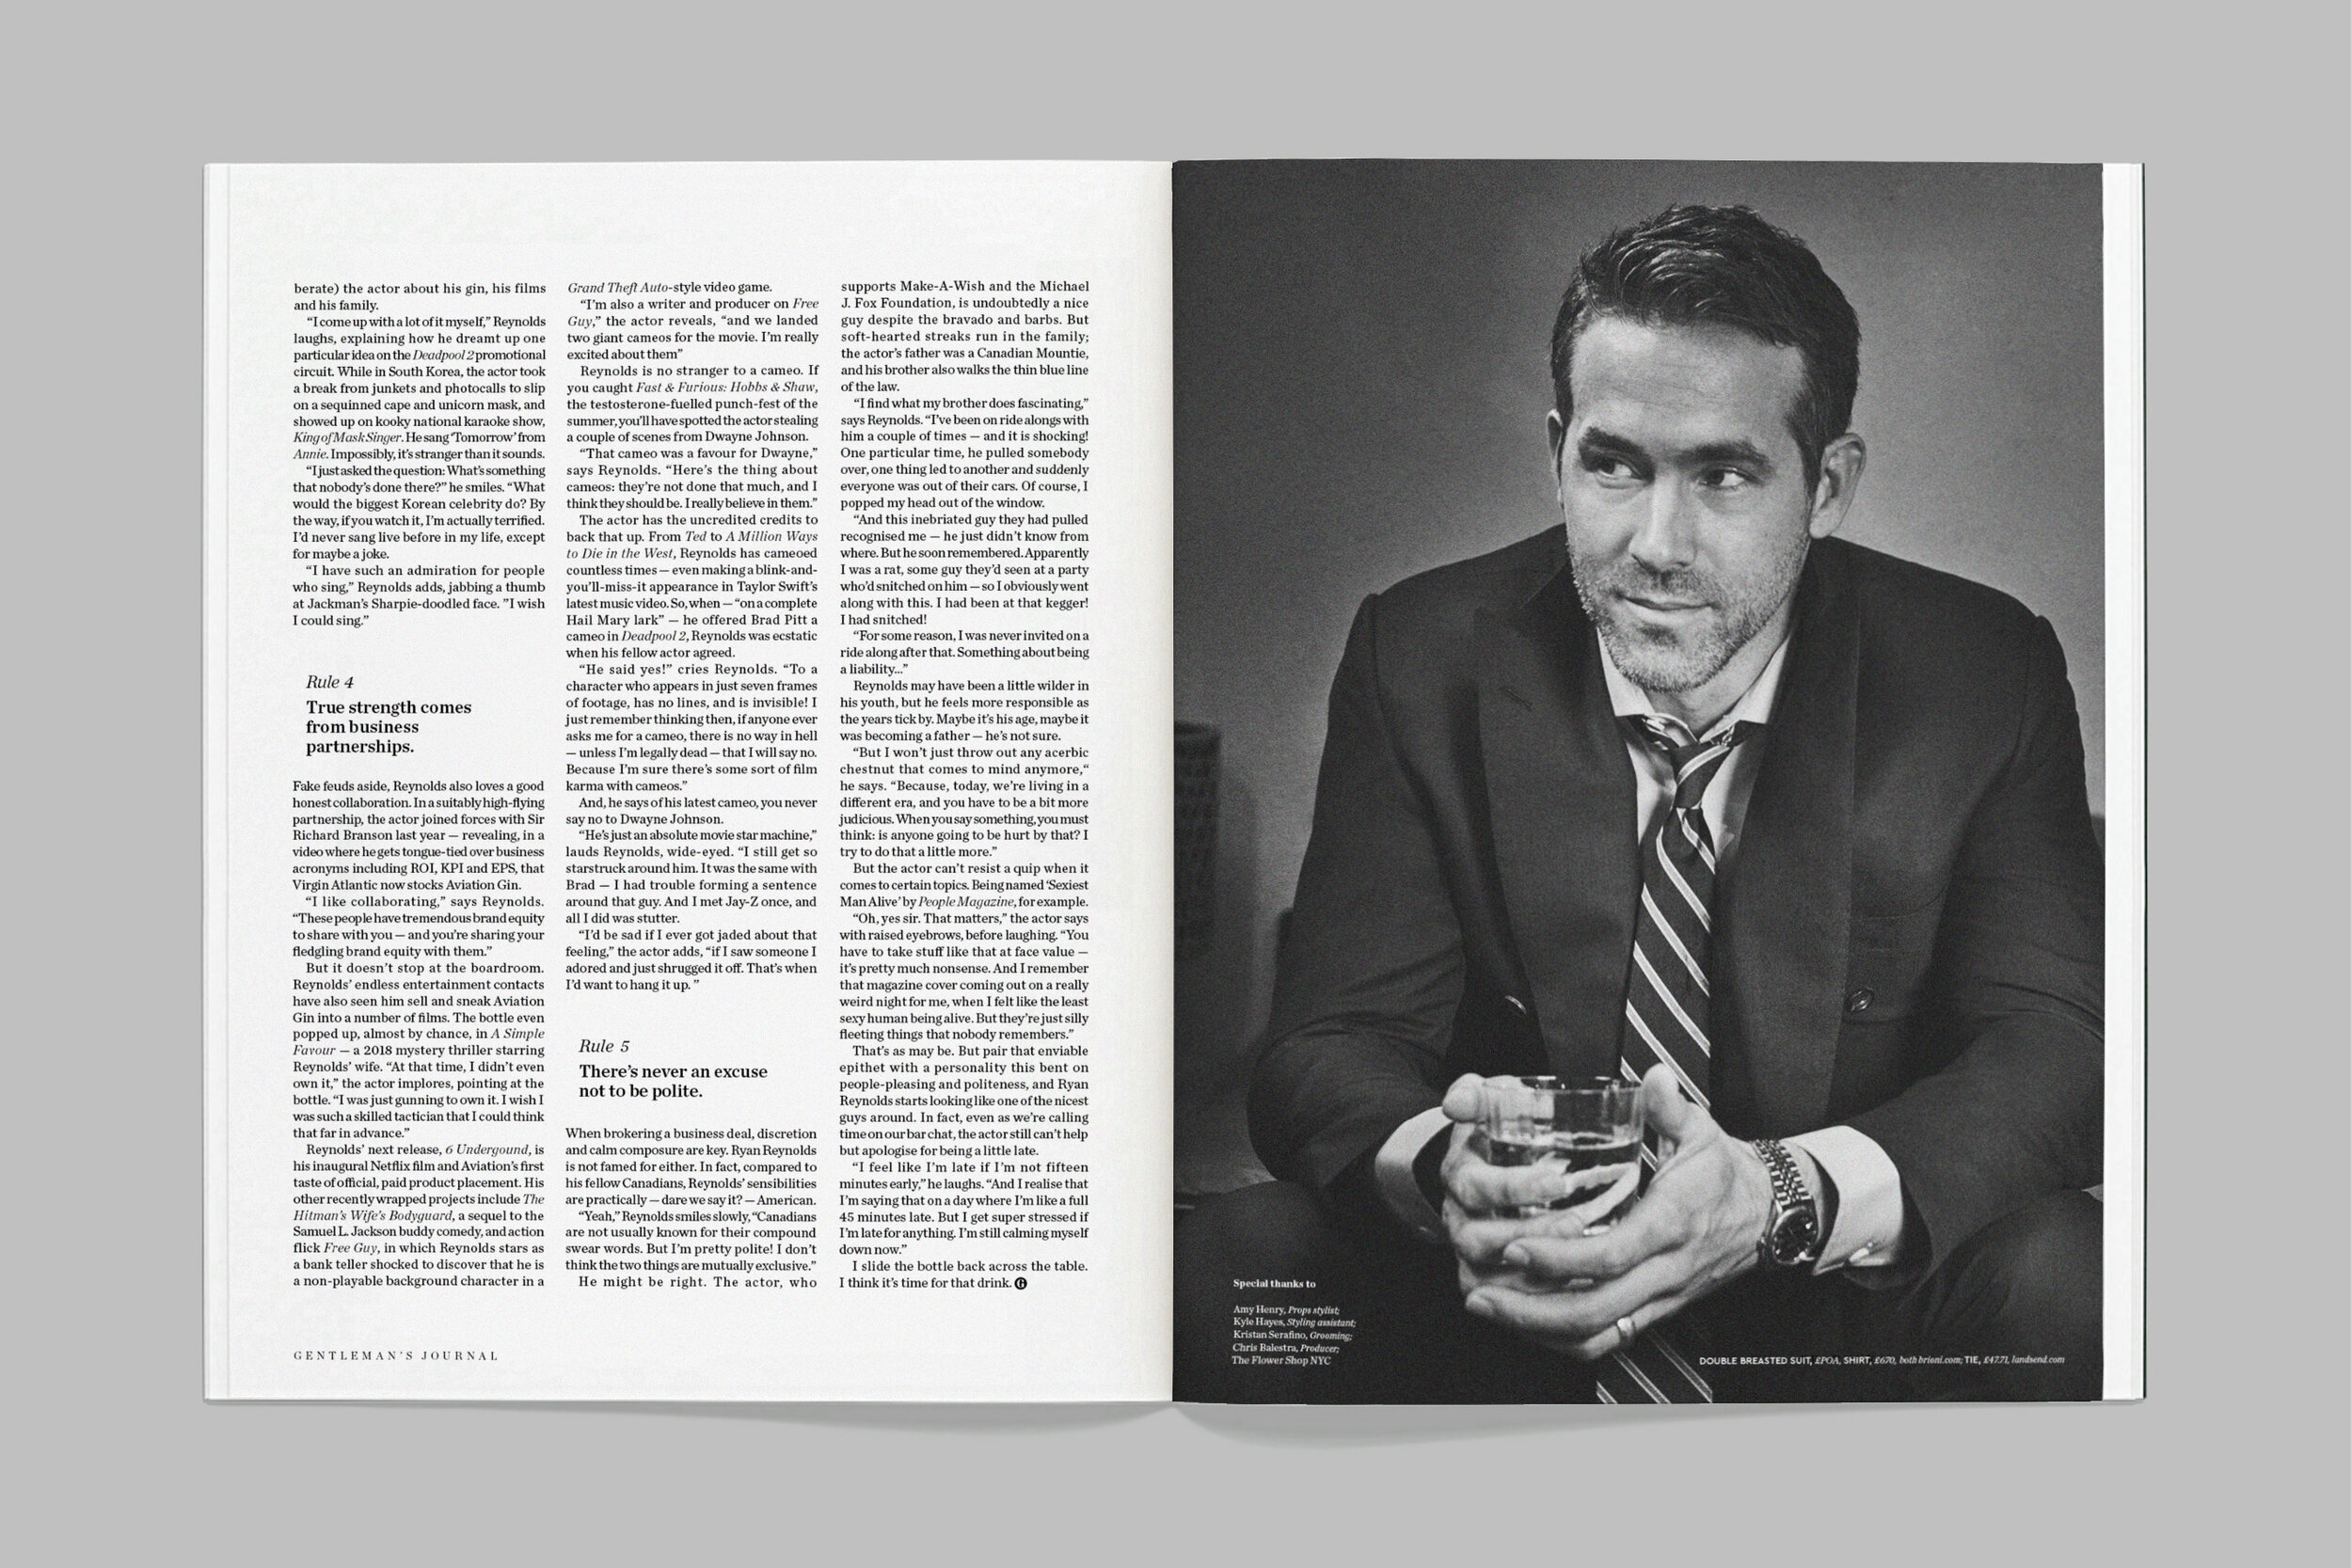 magazine_article_5.jpg